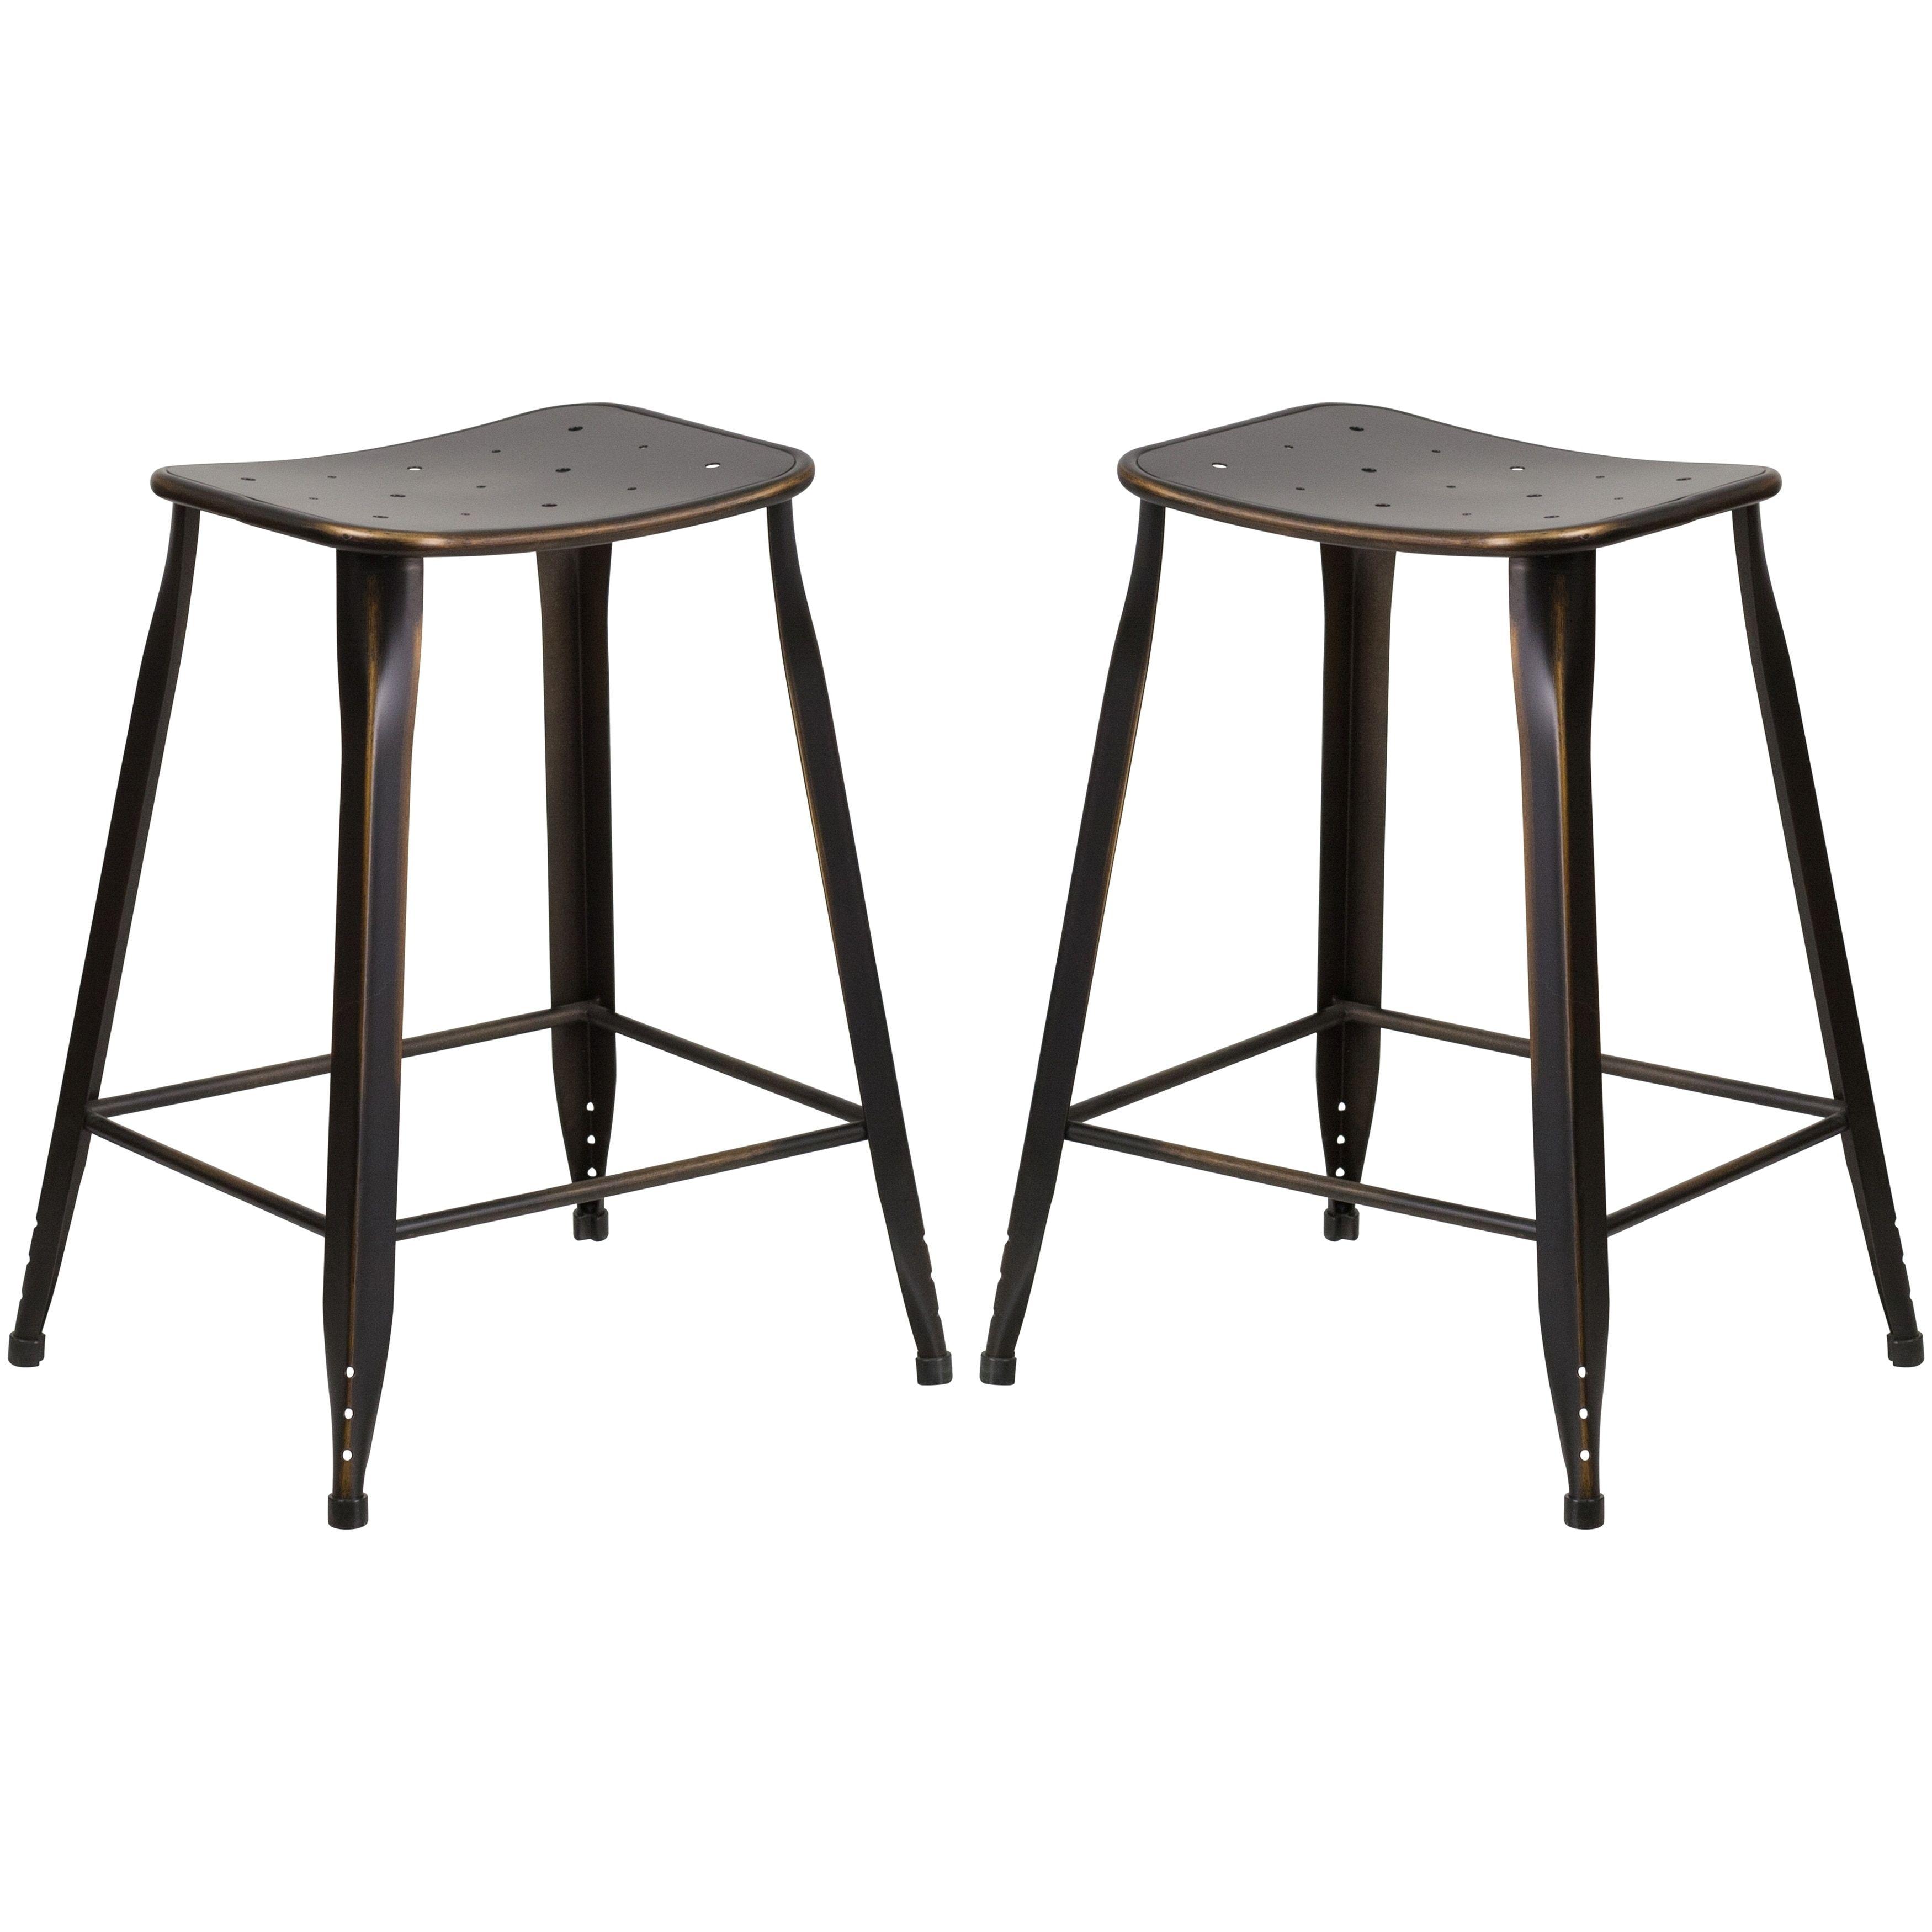 Fabulous Distressed Copper Galvanized Metal 24 Inch Stool 2 Stools Creativecarmelina Interior Chair Design Creativecarmelinacom